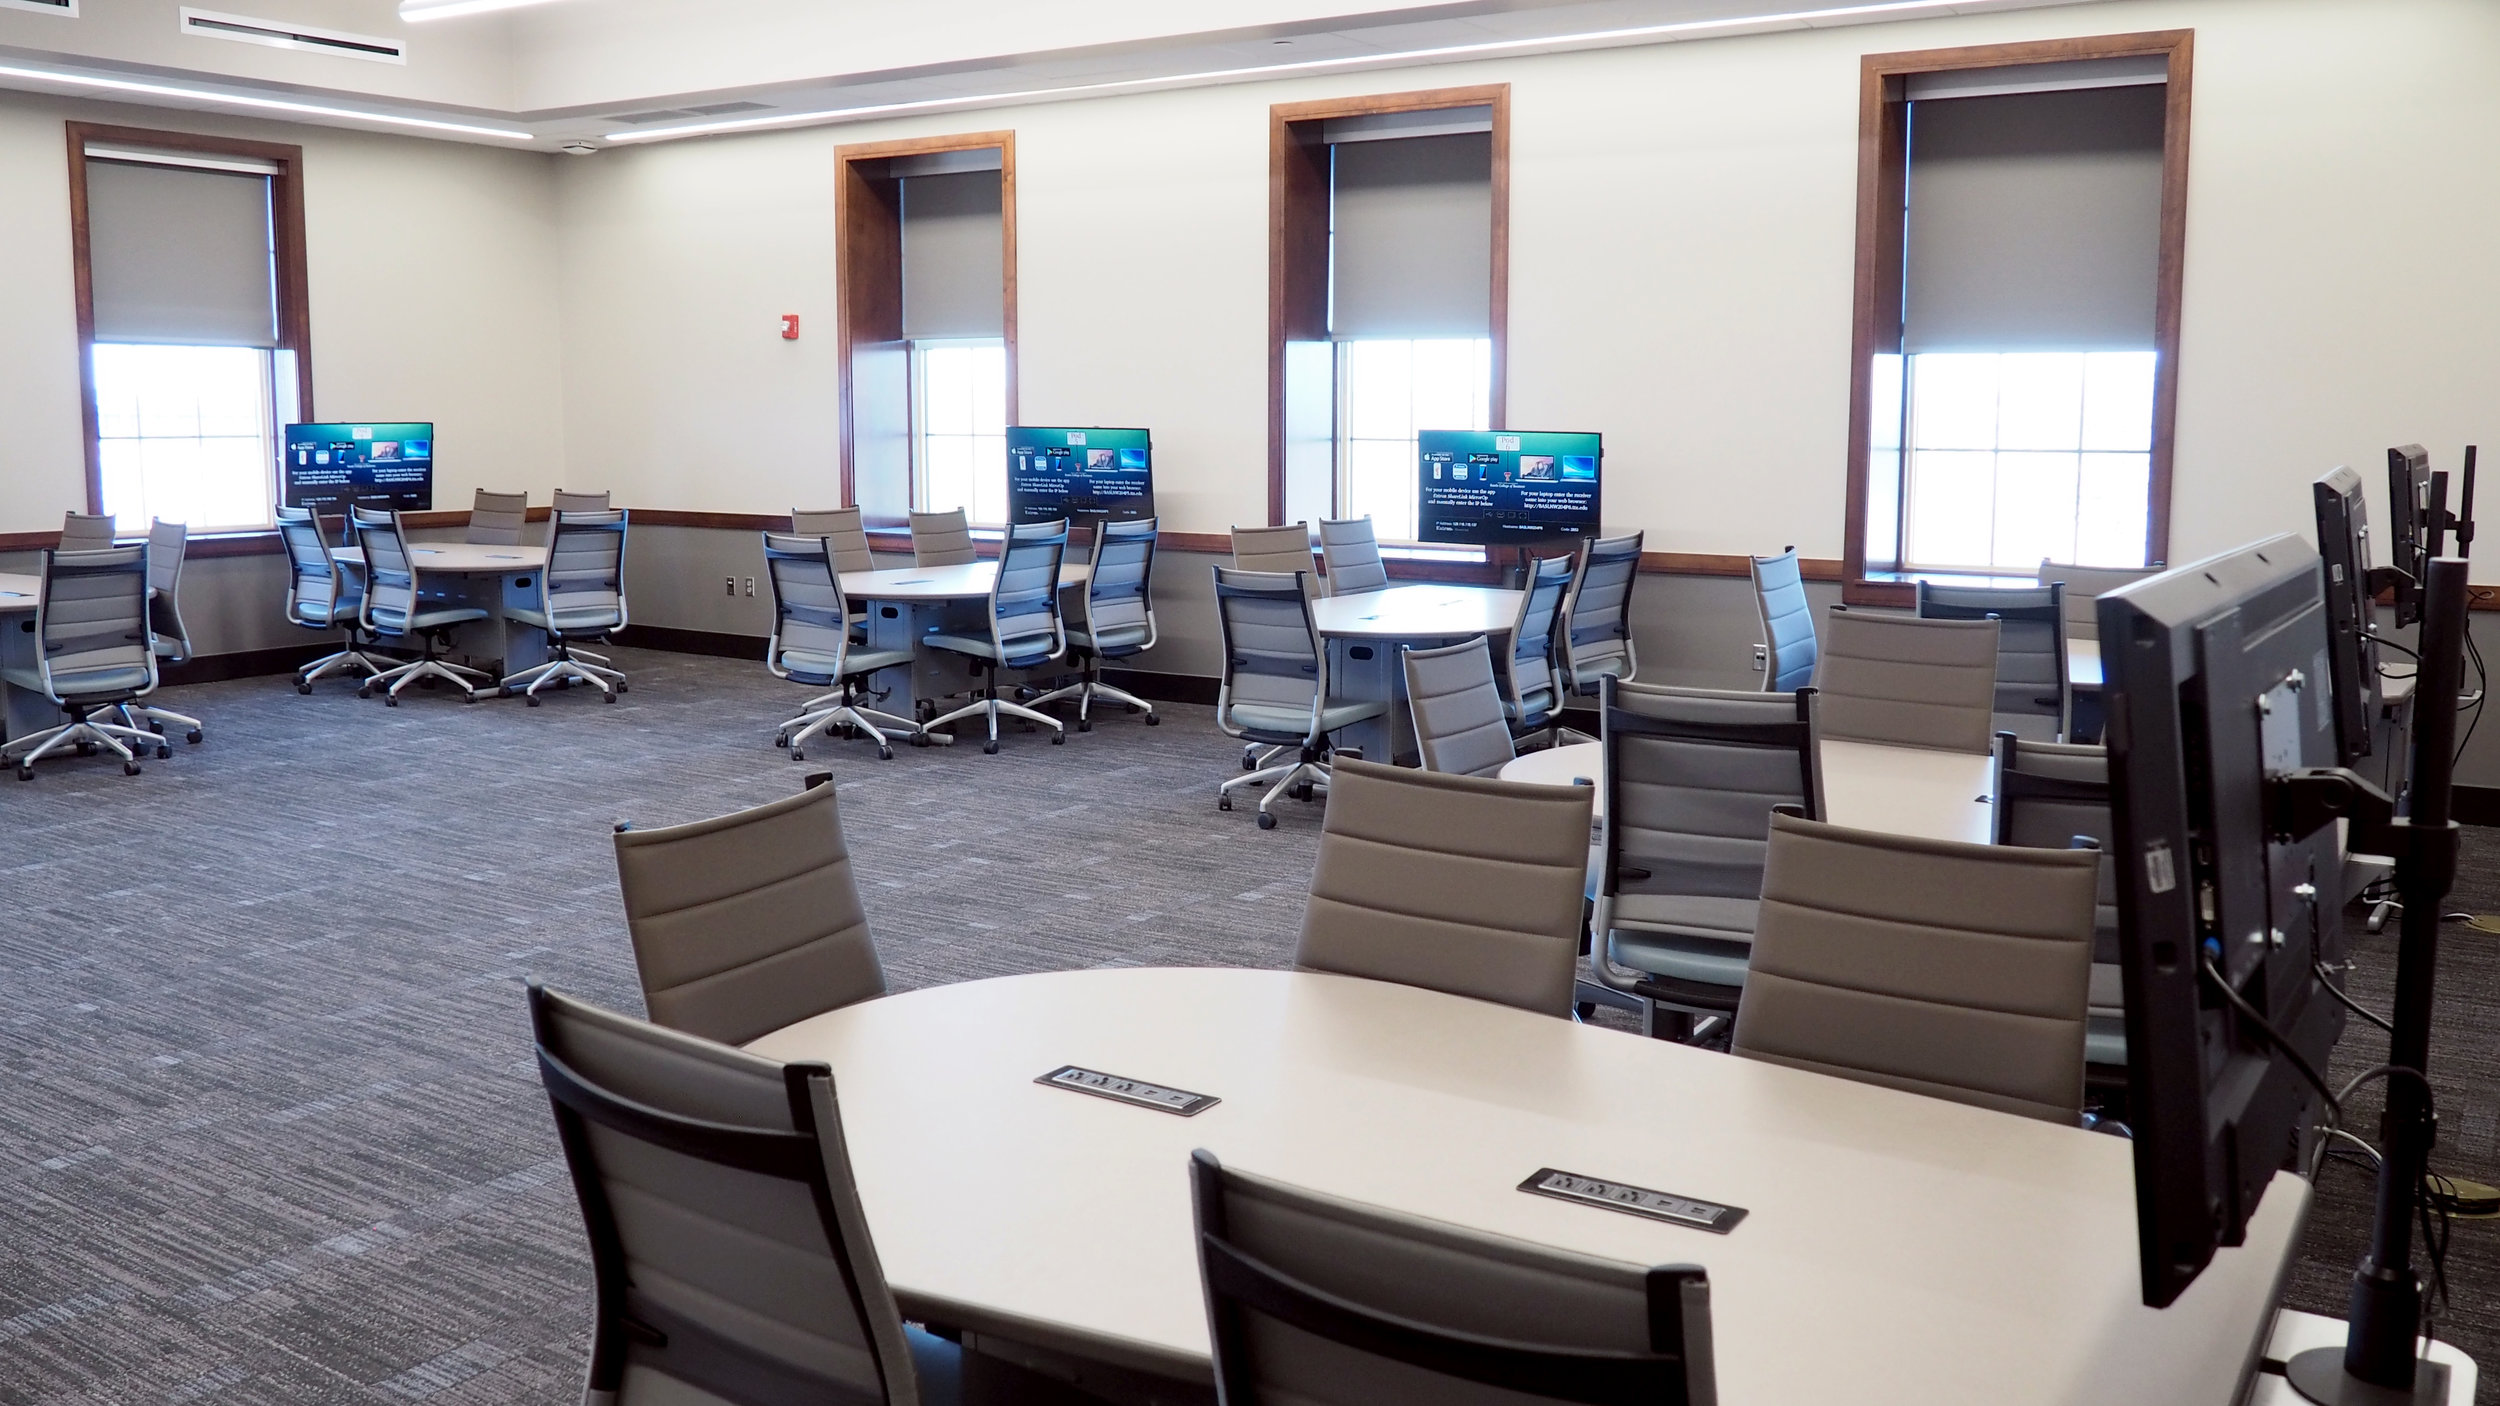 Texas Tech University Rawls College of Business